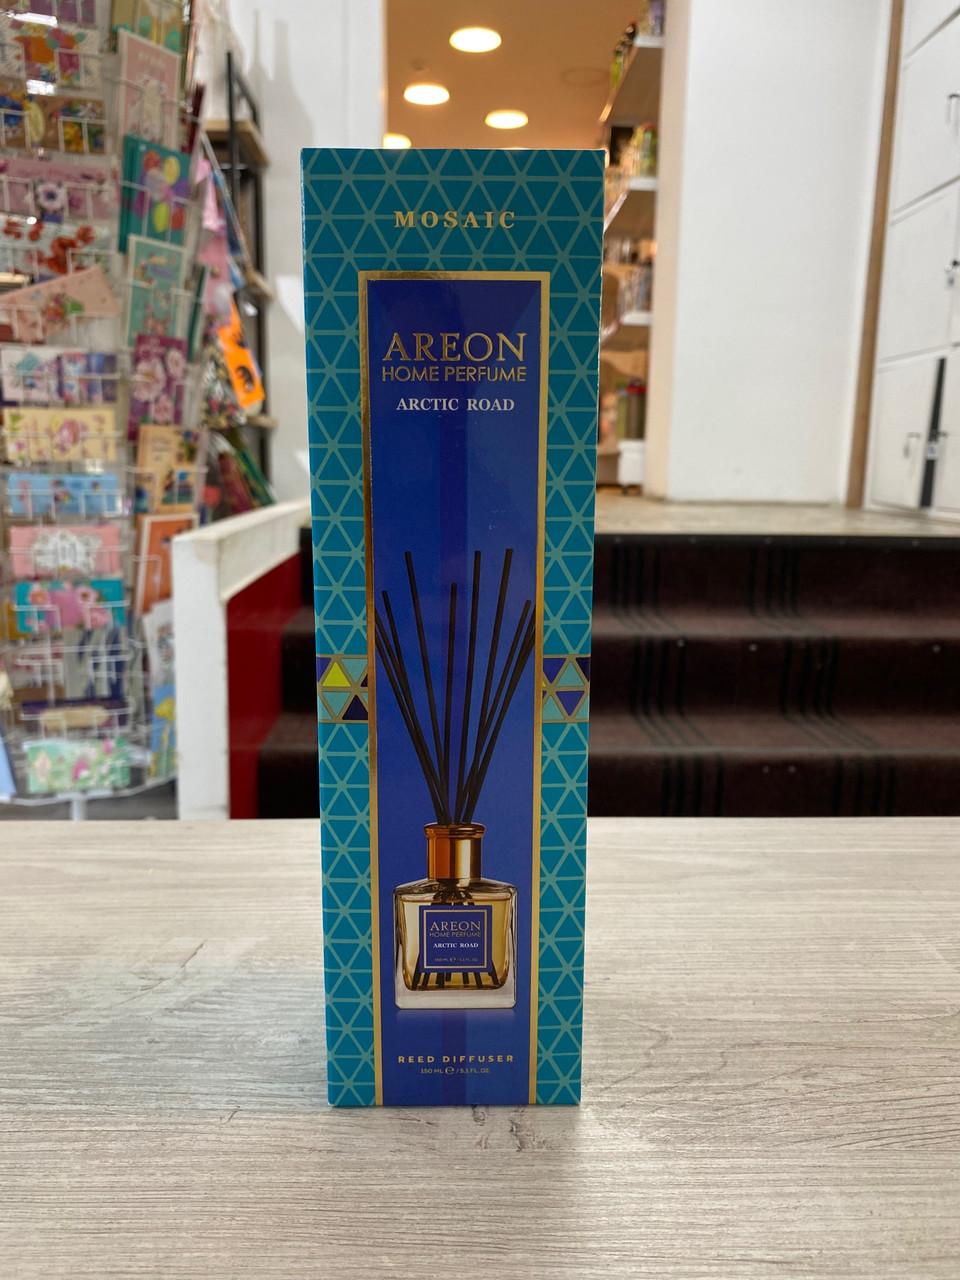 Areon ароматизатор для дома серия Mosaic парфюмированная 150 мл Arctic Road